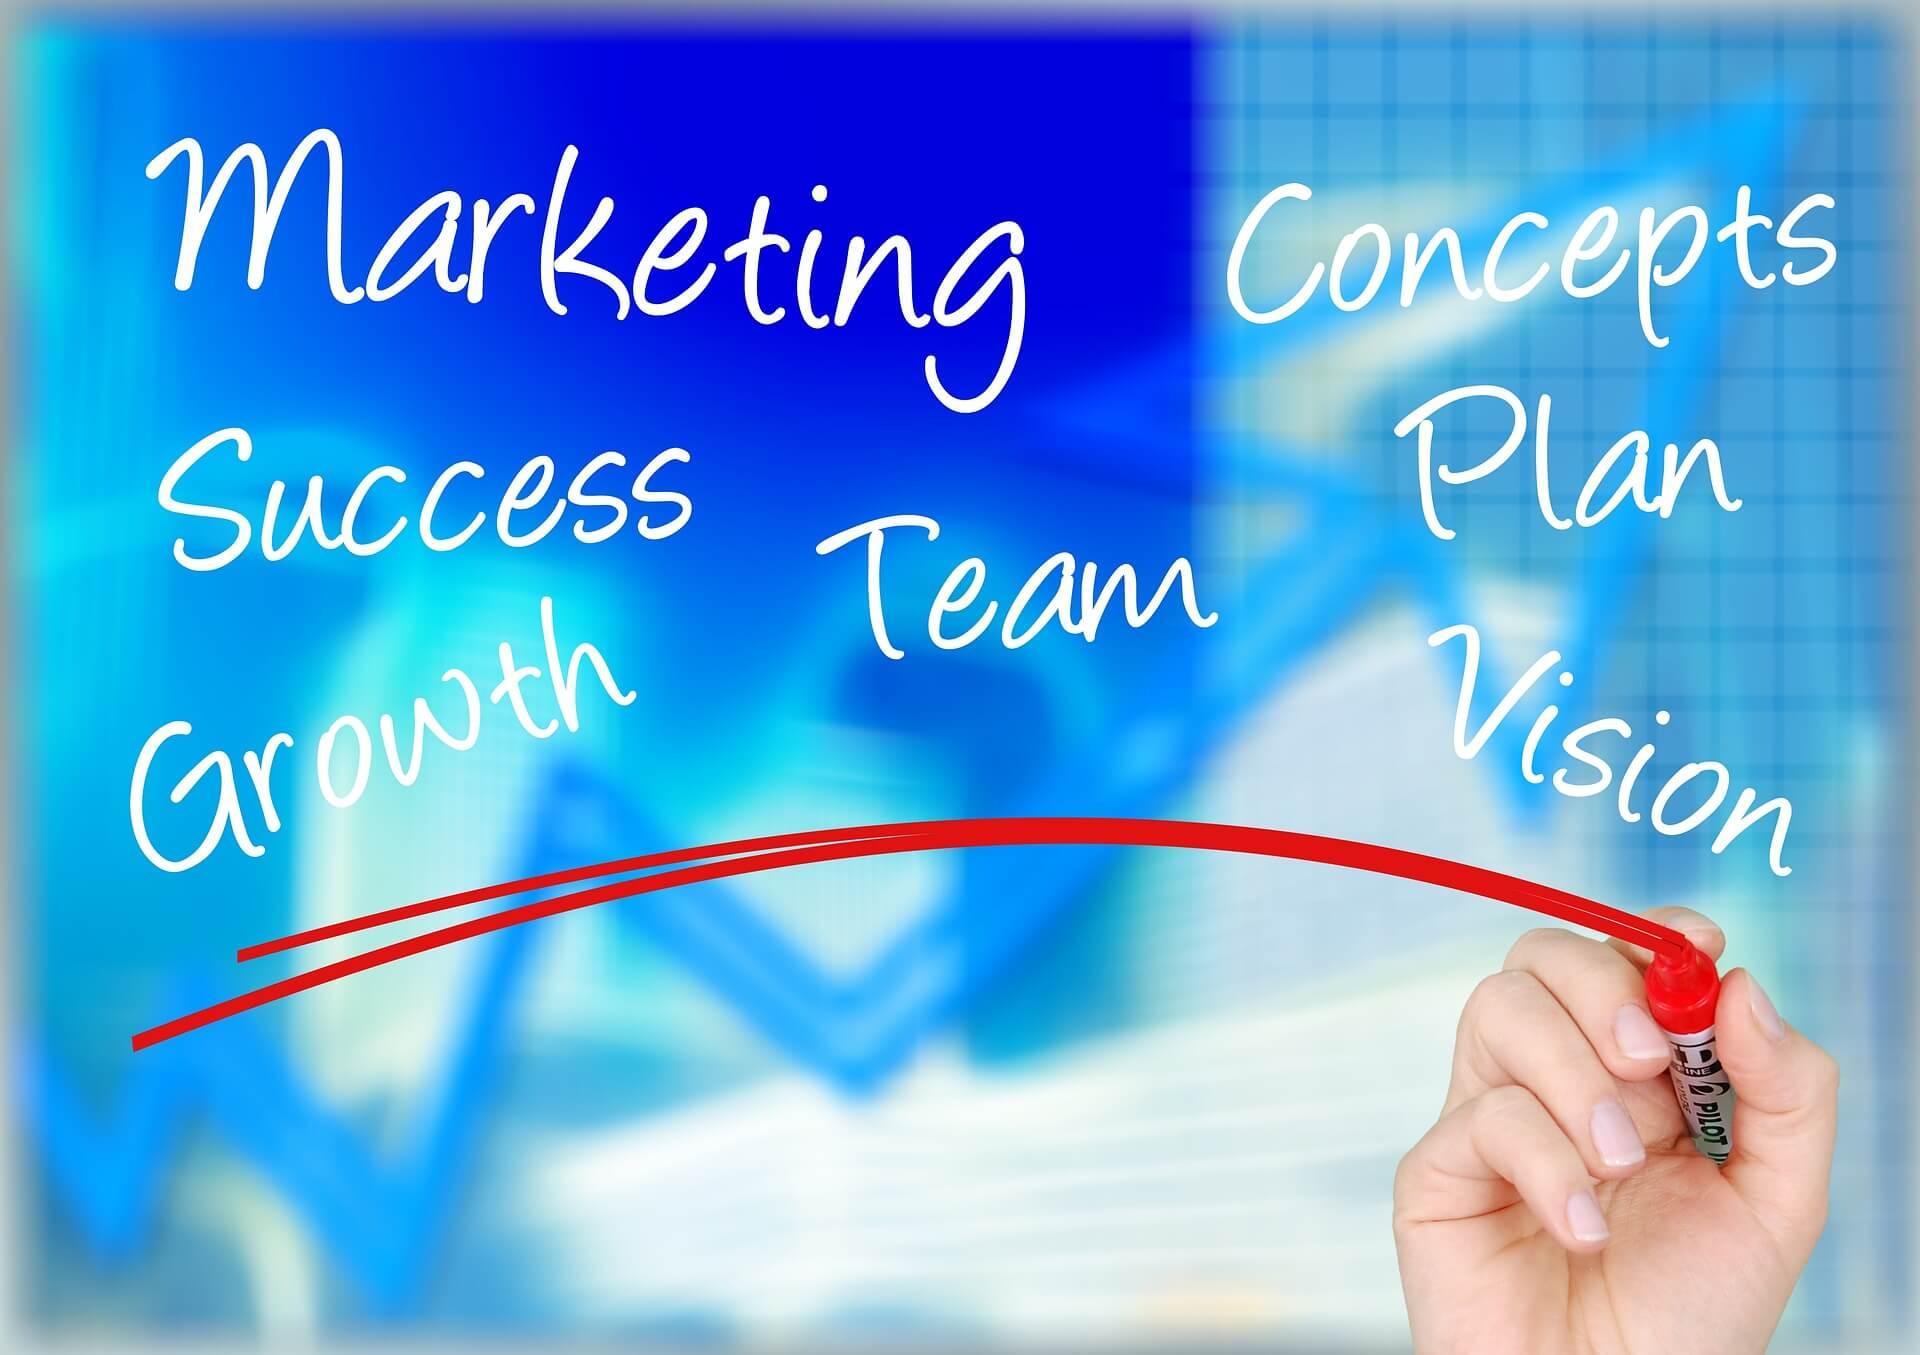 Full Service Advertising Agency, Digital Marketing, Radio, Events, Television, TV